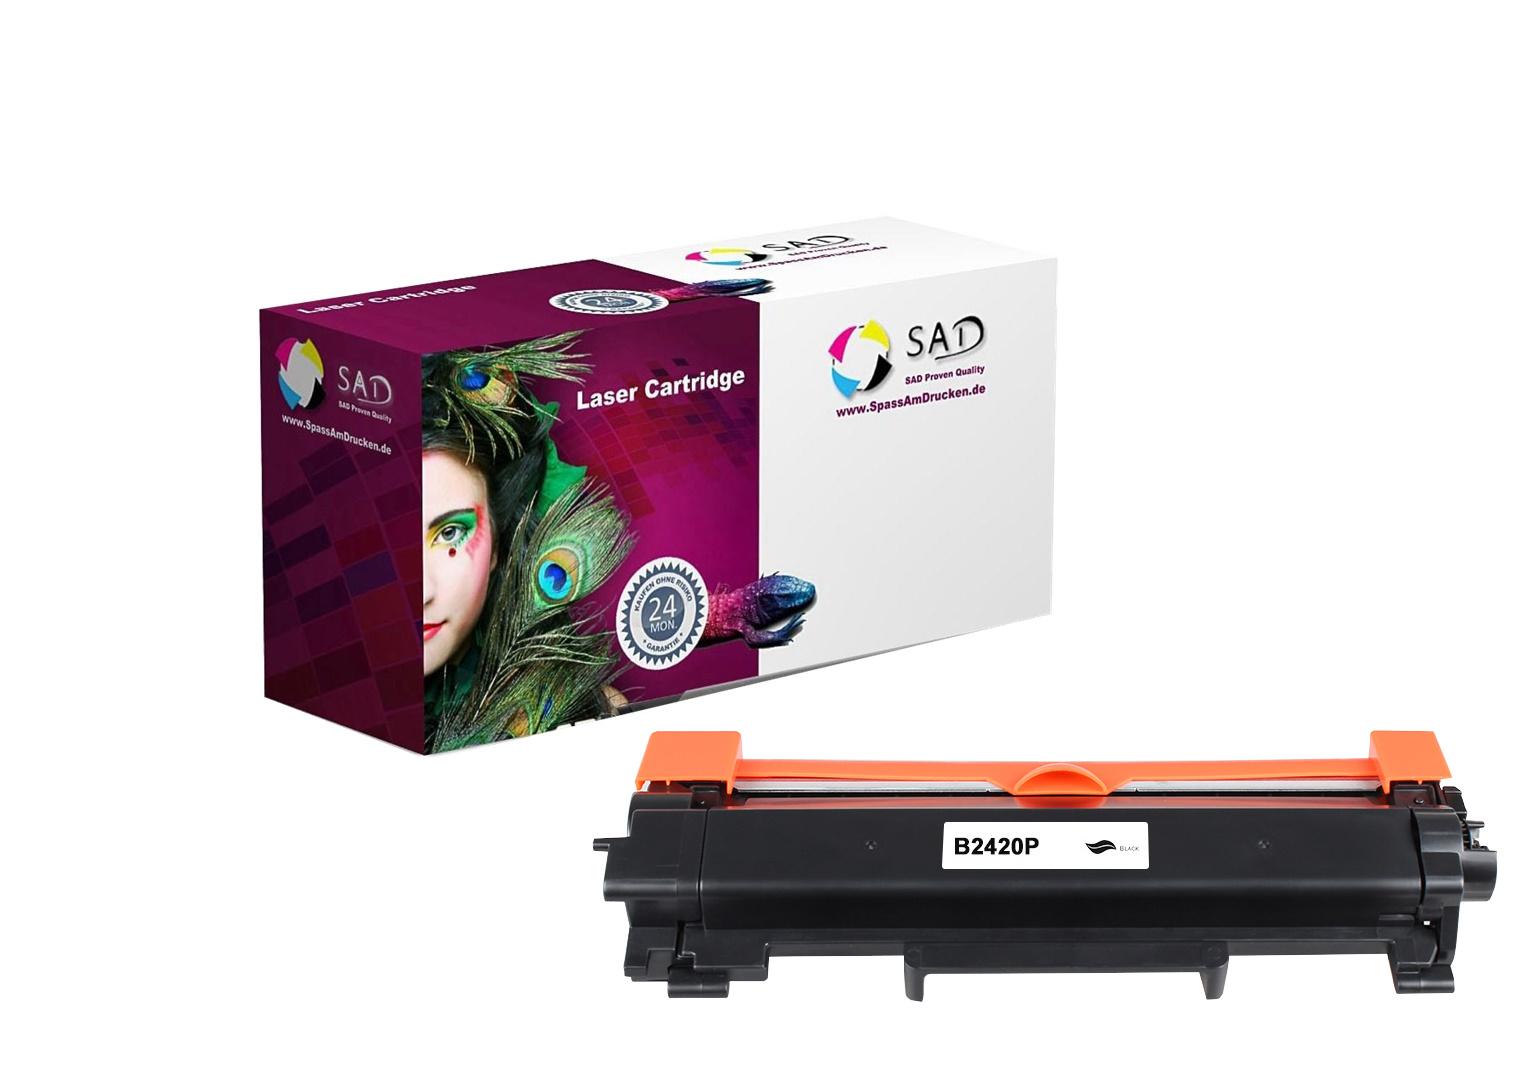 SAD Premium Toner komp. mit Brother TN-2420 schwarz / black mit Chip